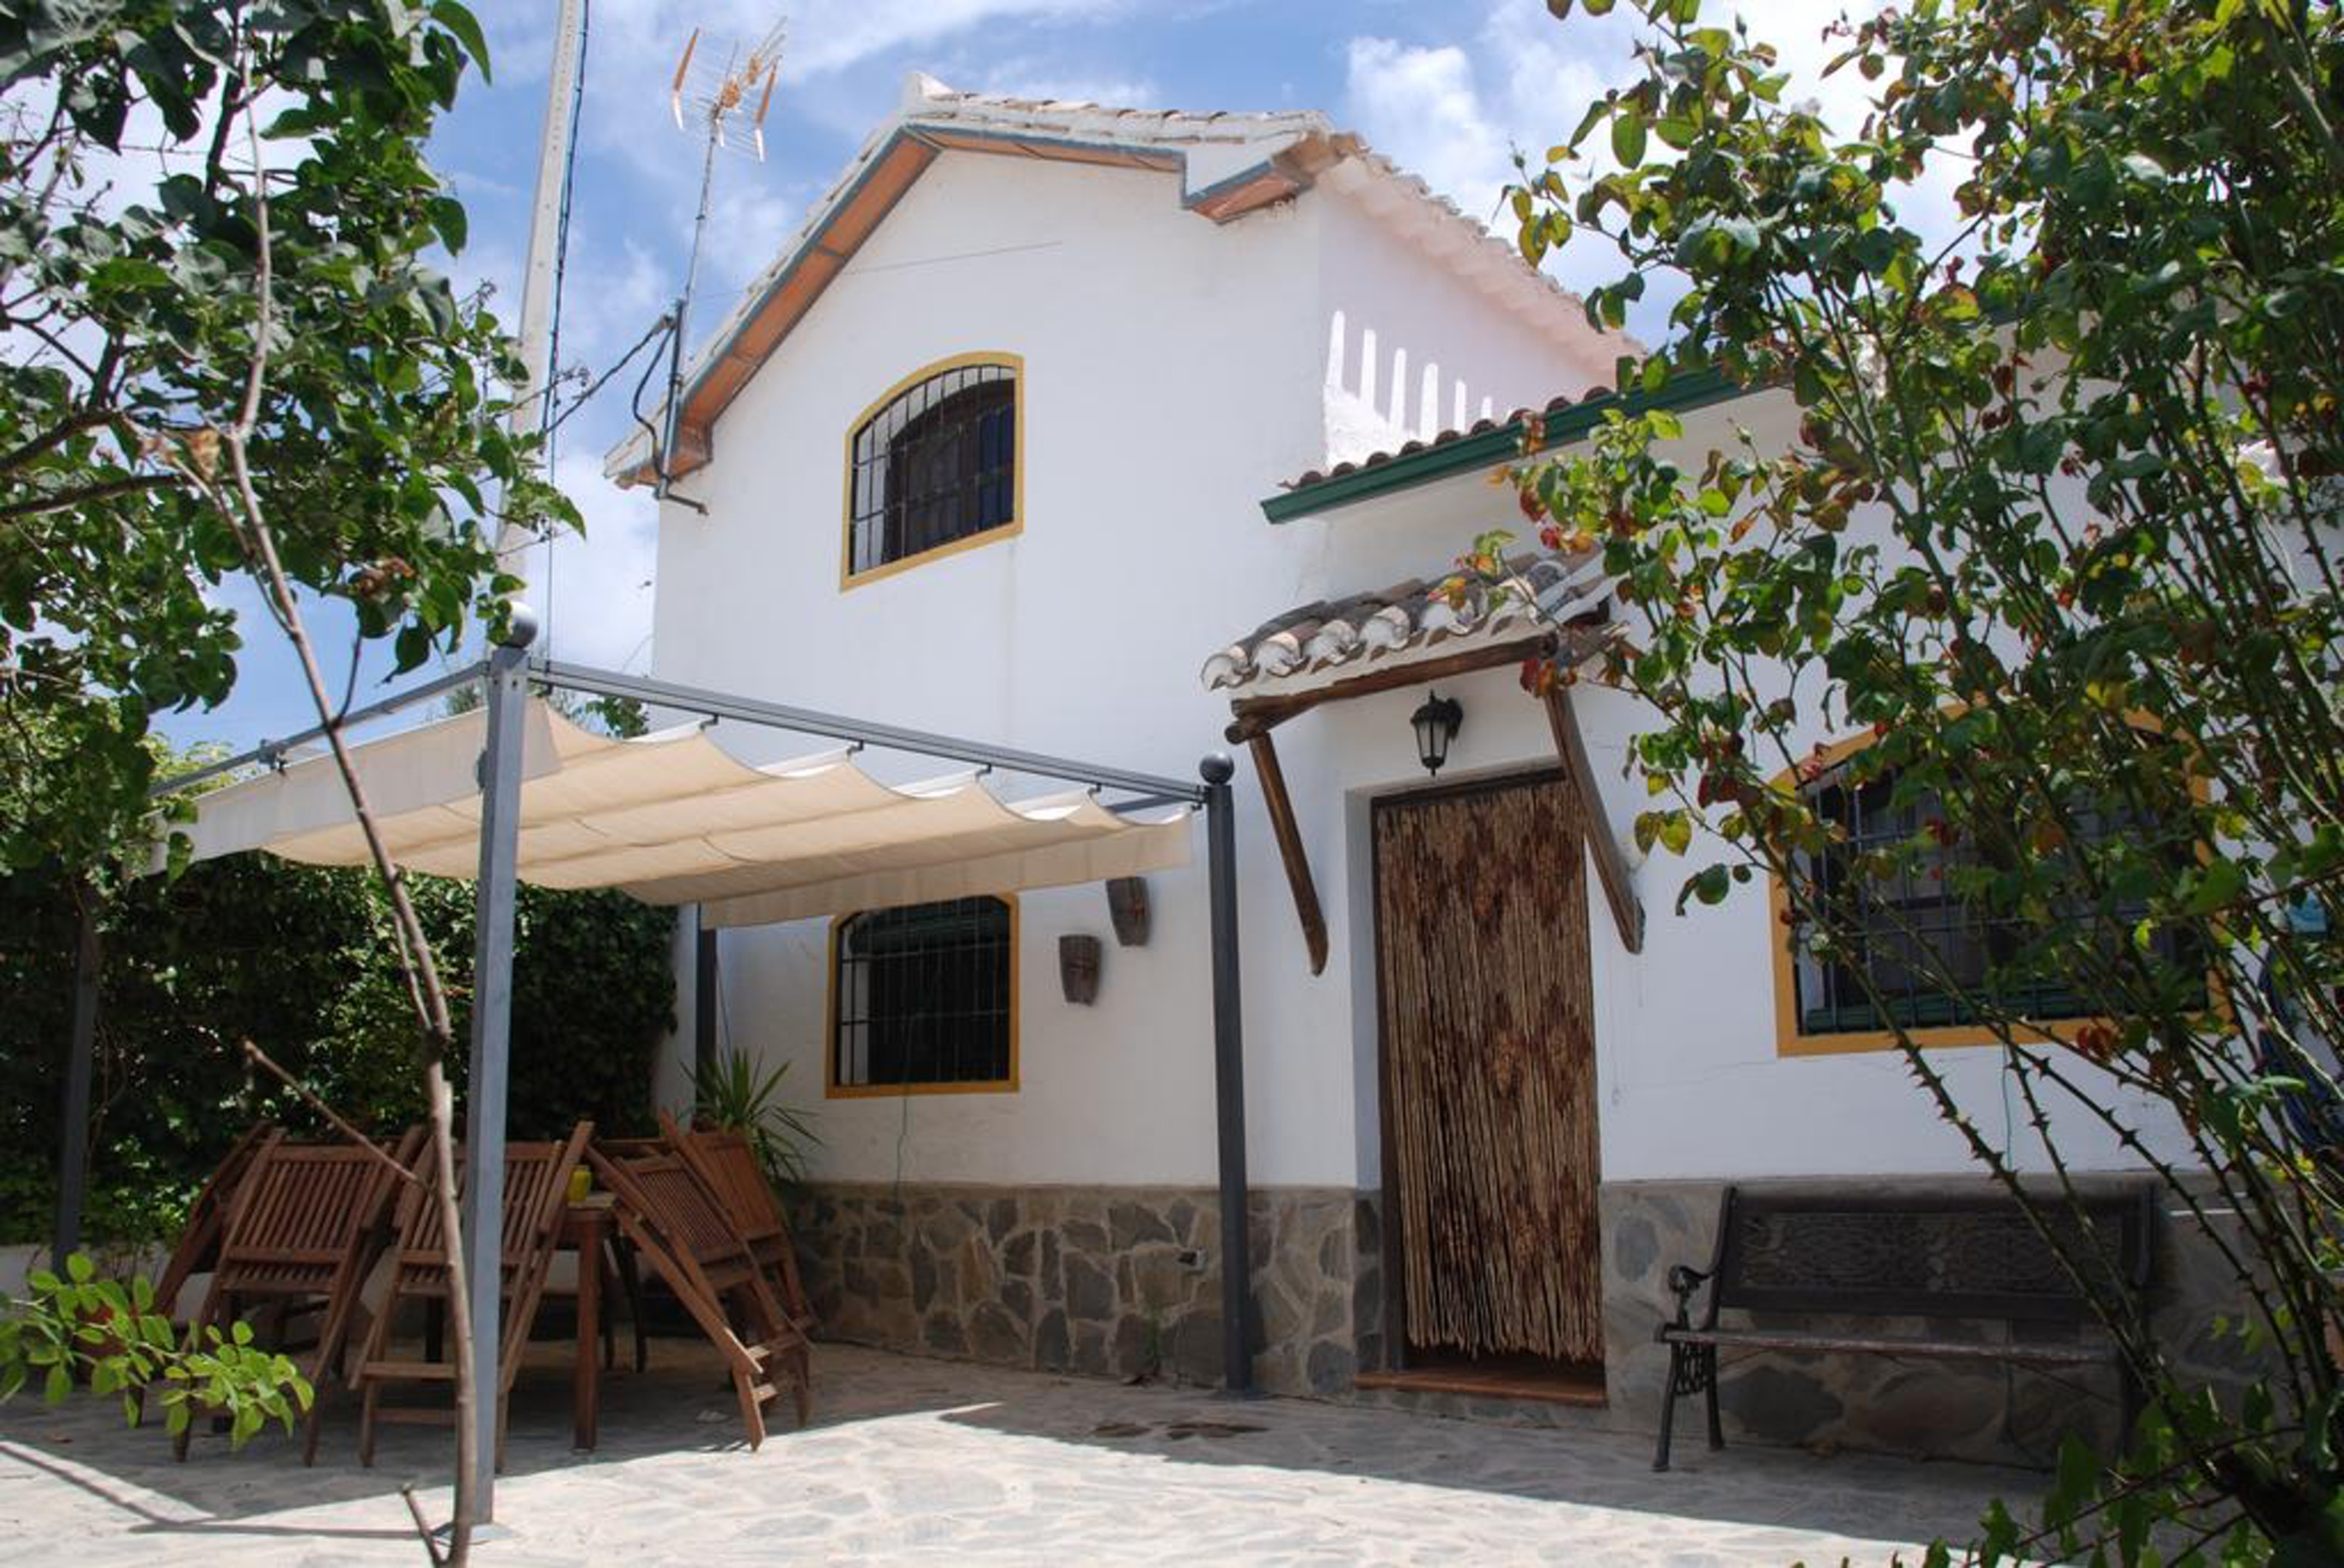 Villa mit 7 Schlafzimmern in Villanueva del Trabuc Villa